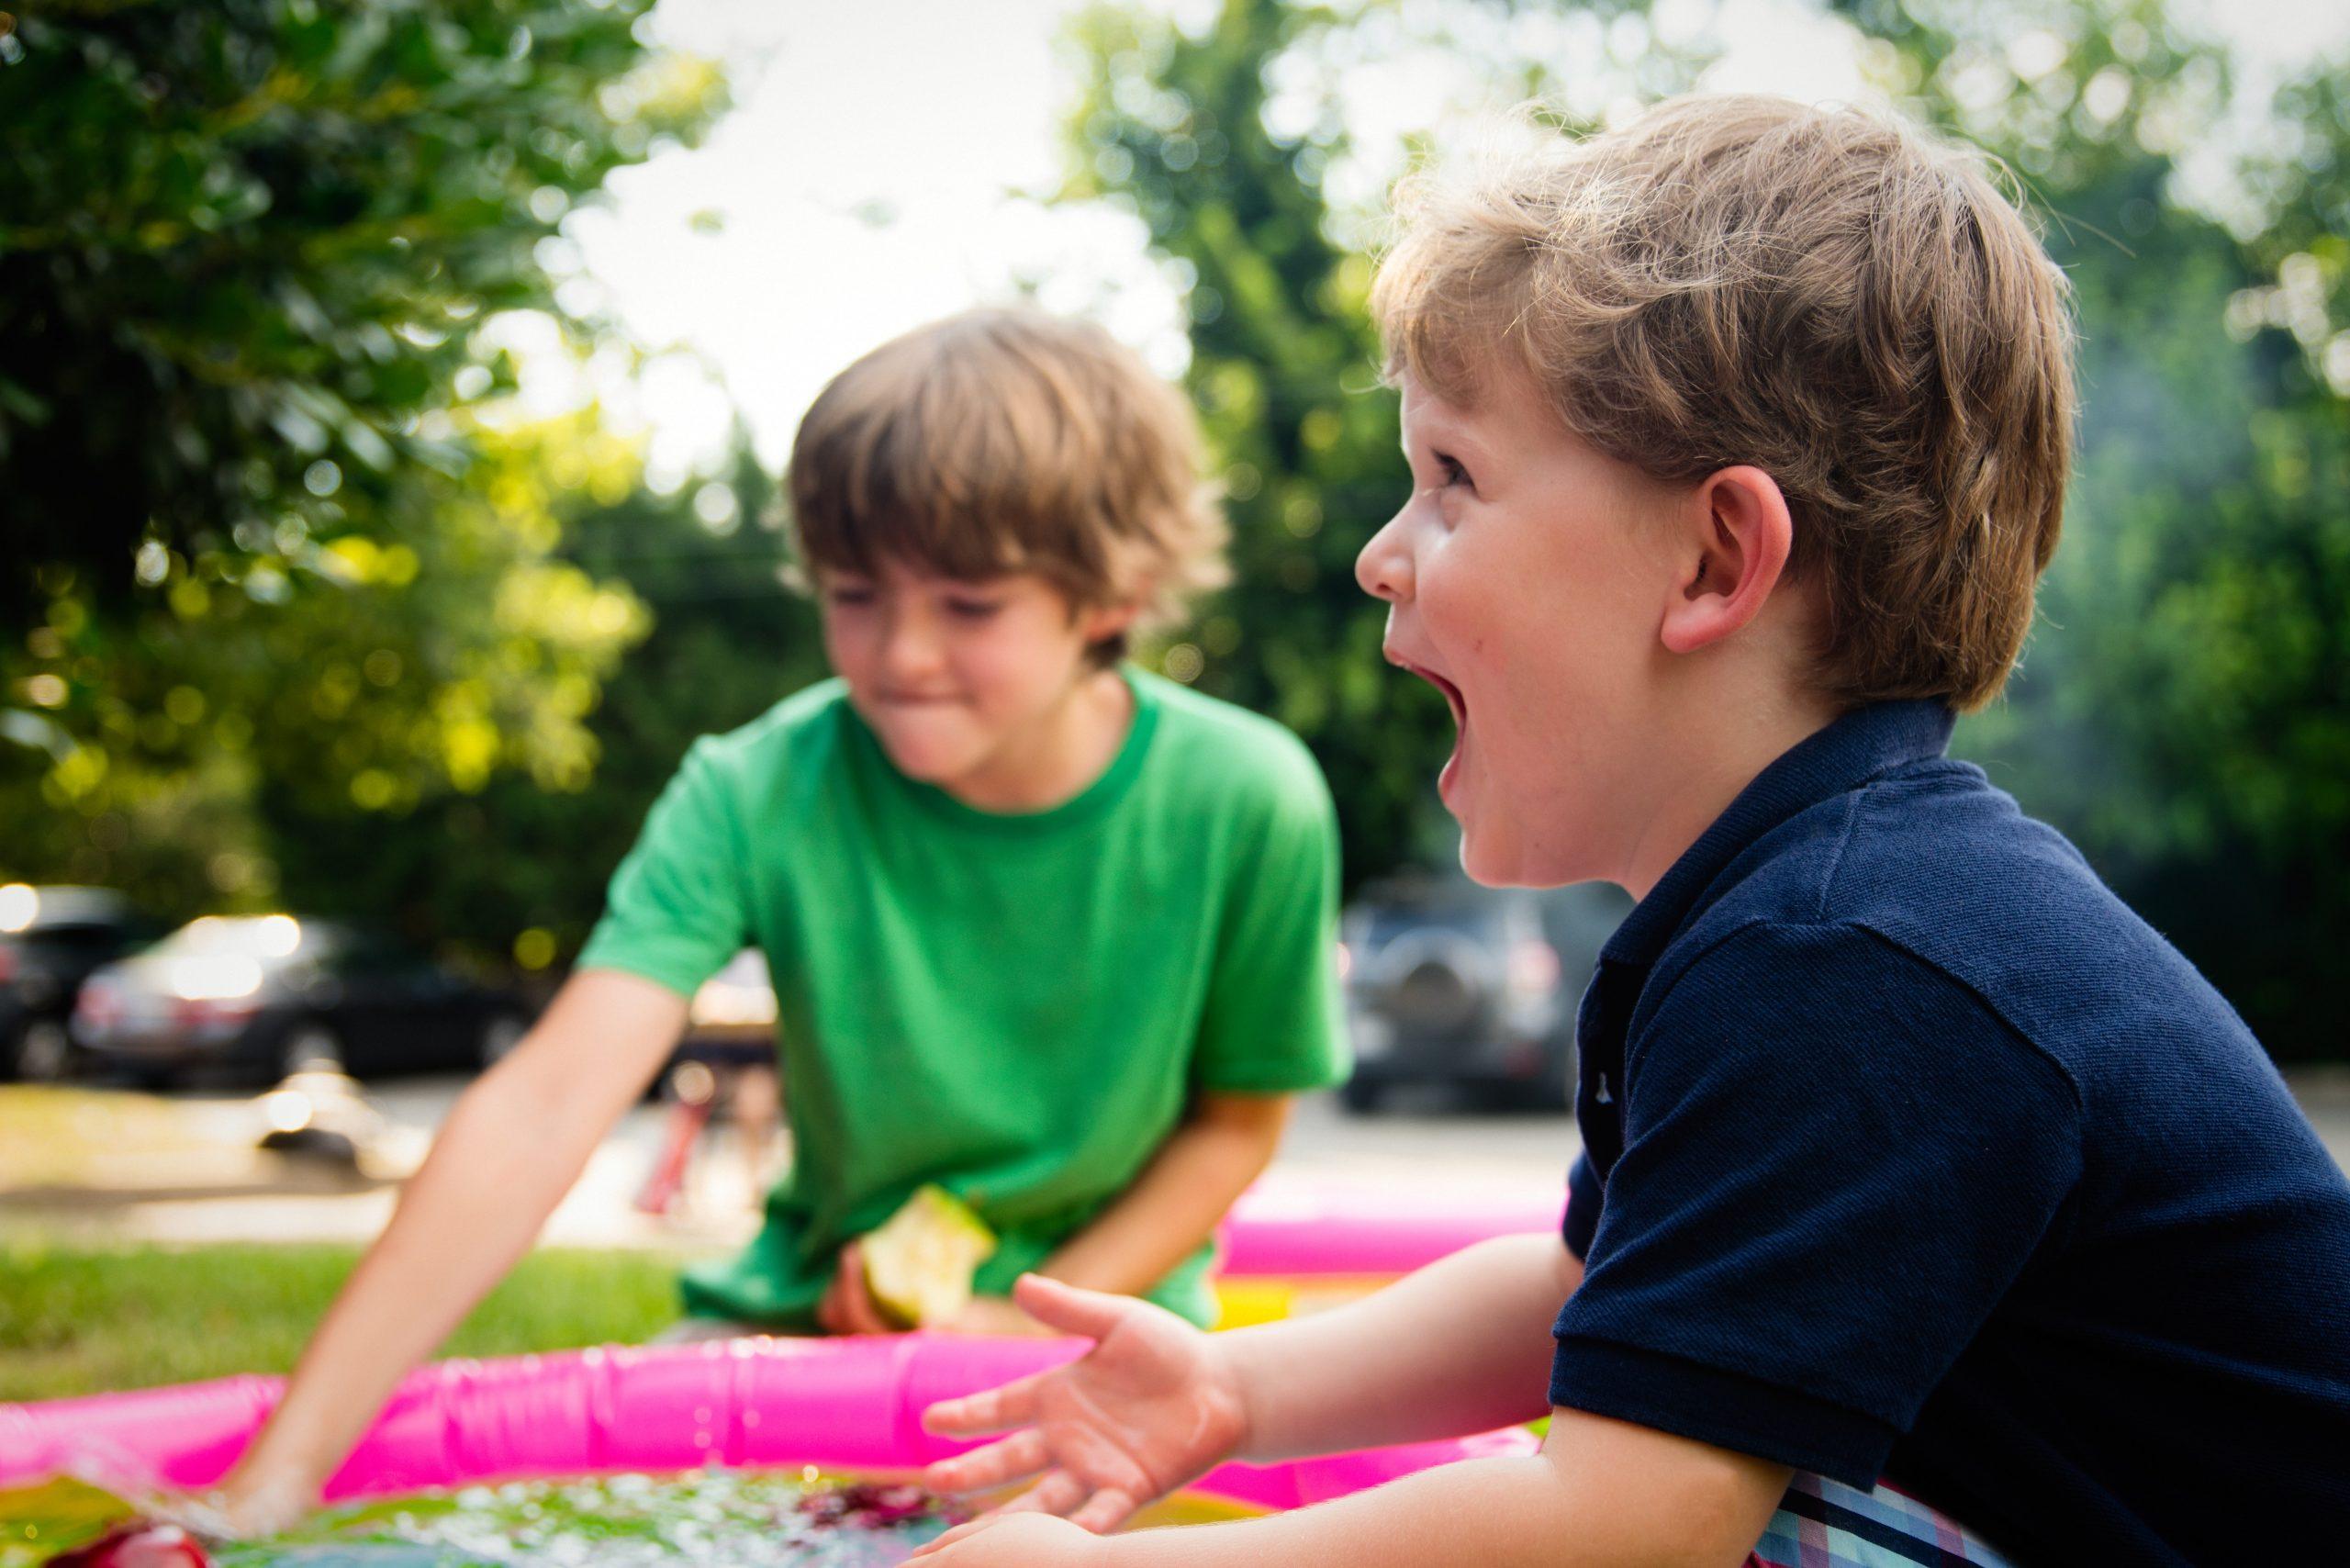 boys playing in the backyard